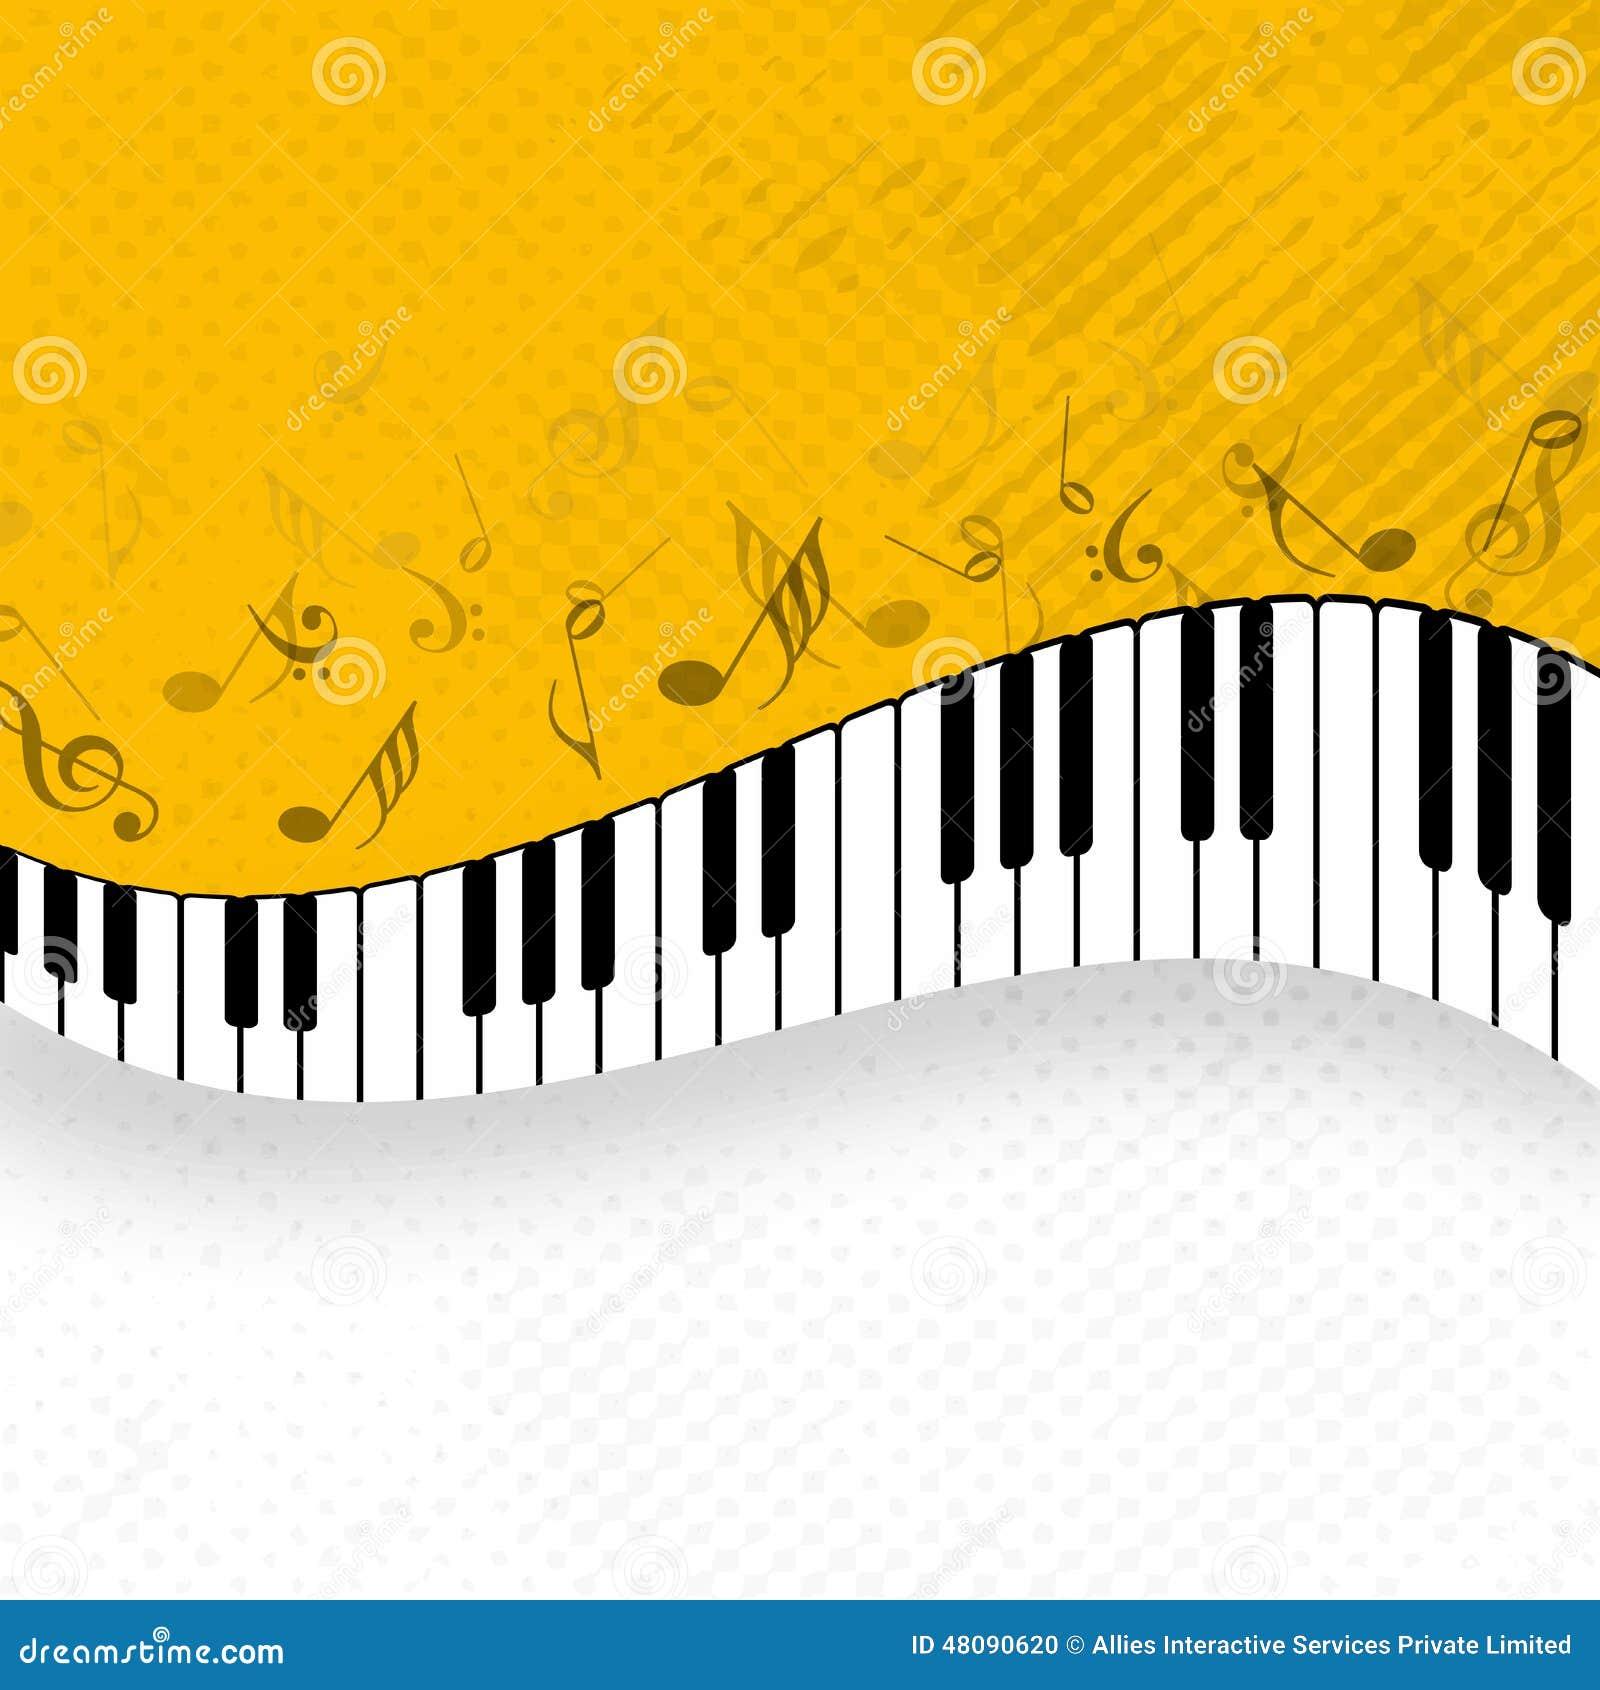 instruments keyboard wallpaper - photo #42